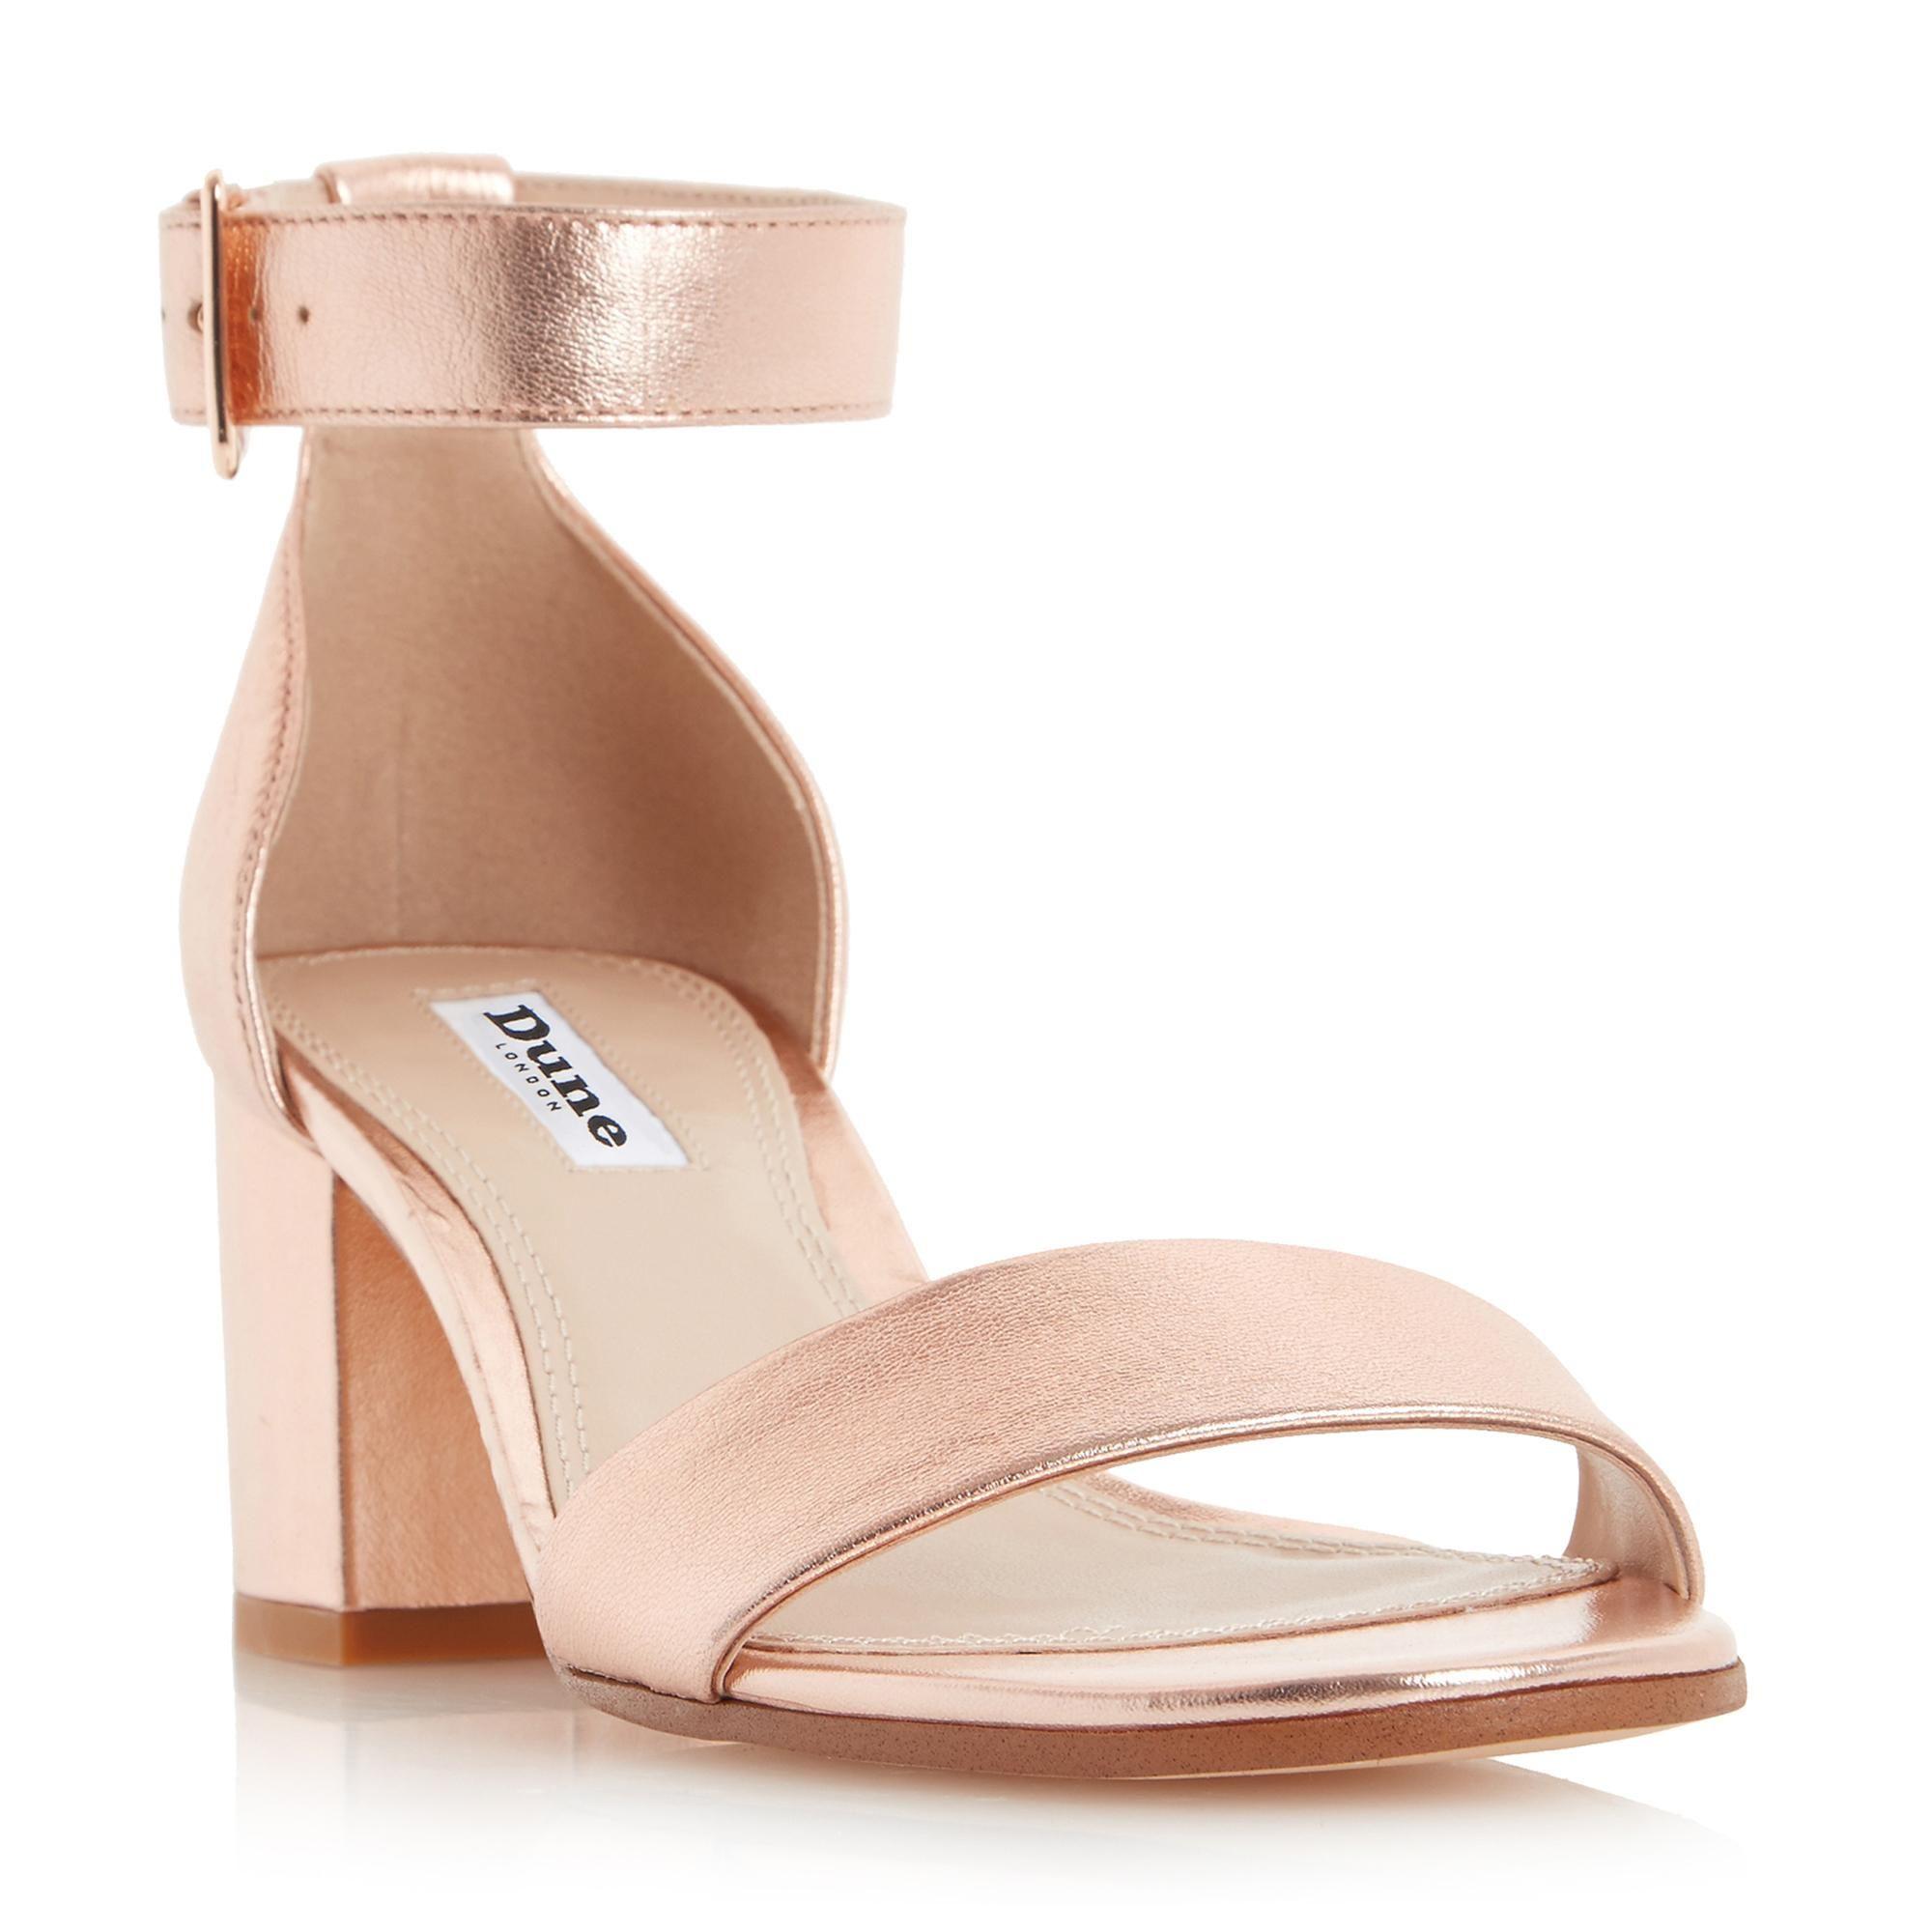 657e8c8fc74 DUNE LADIES JAYGO - Two Part Block Heel Sandal - rose gold